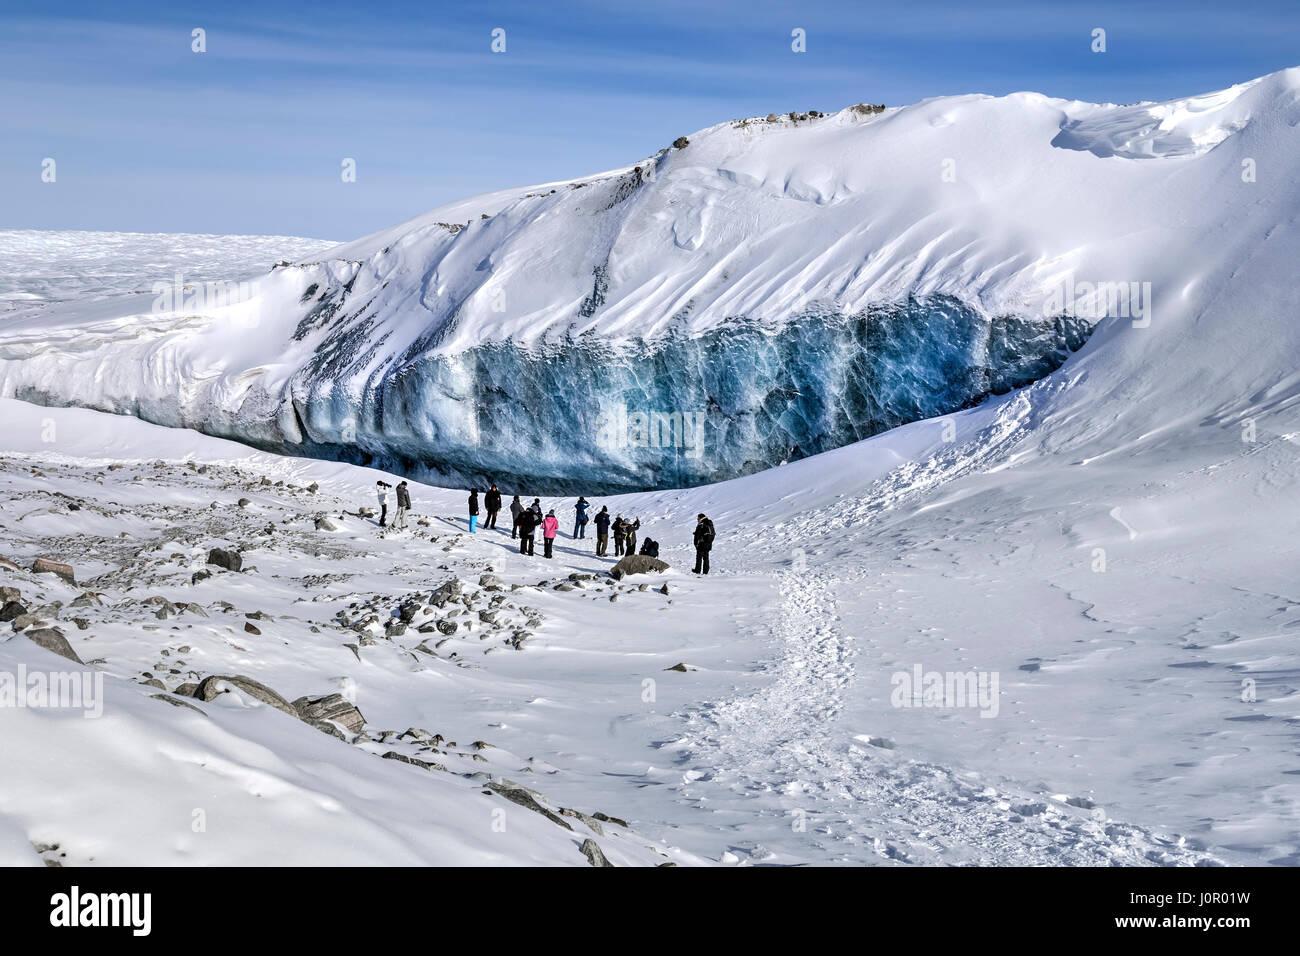 Ice Cap, Point 660, Kangerlussuaq, Artic Circle, Greenland, Europe - Stock Image